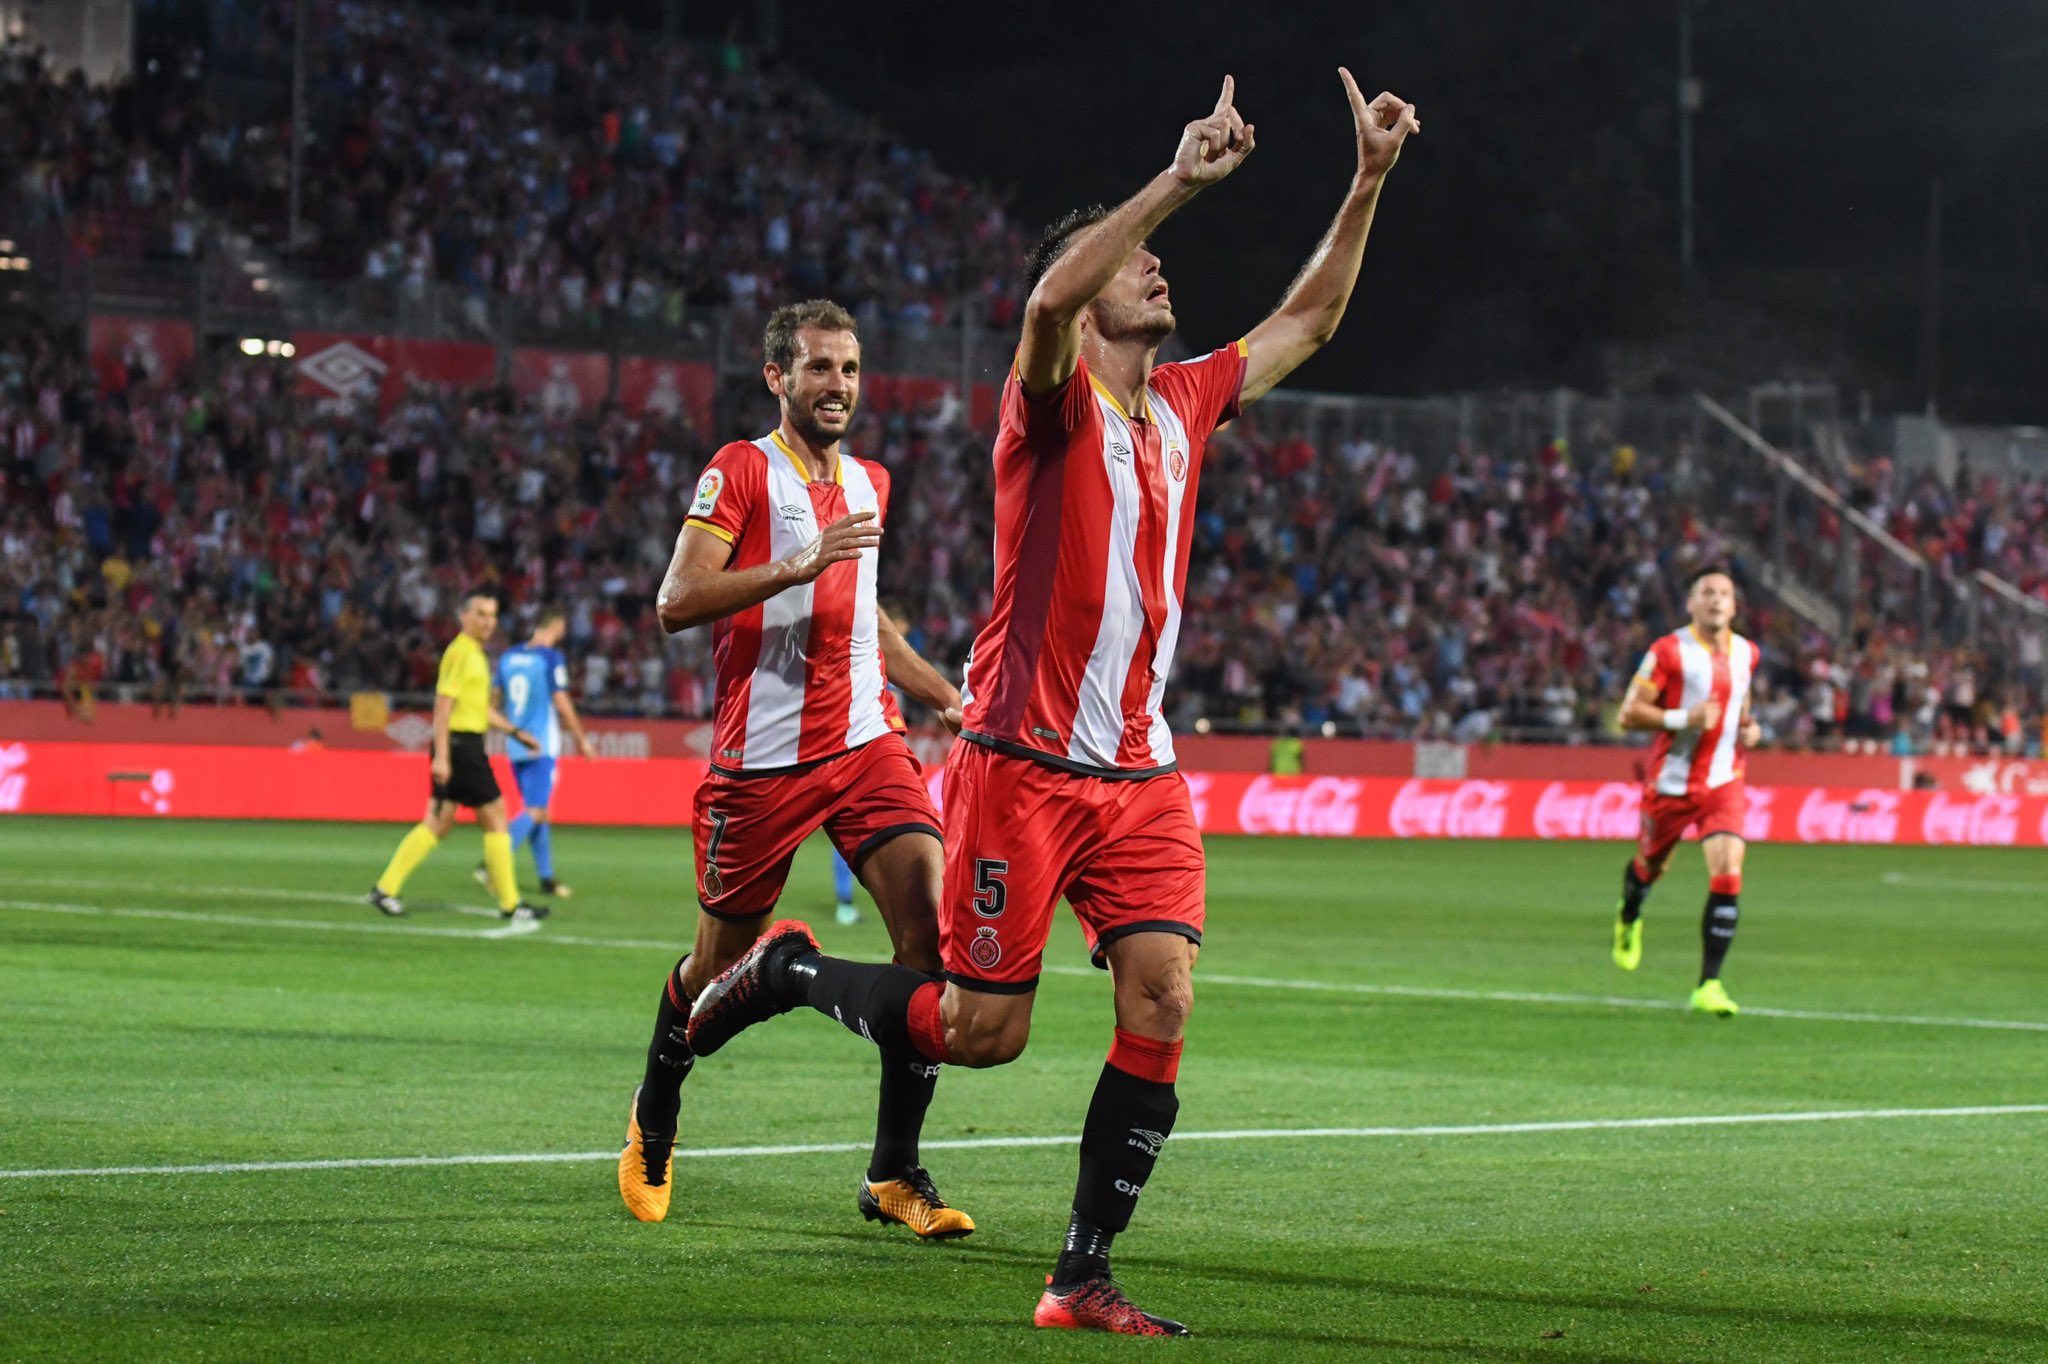 Alcala Stuani gol Girona Malaga   Girona FC